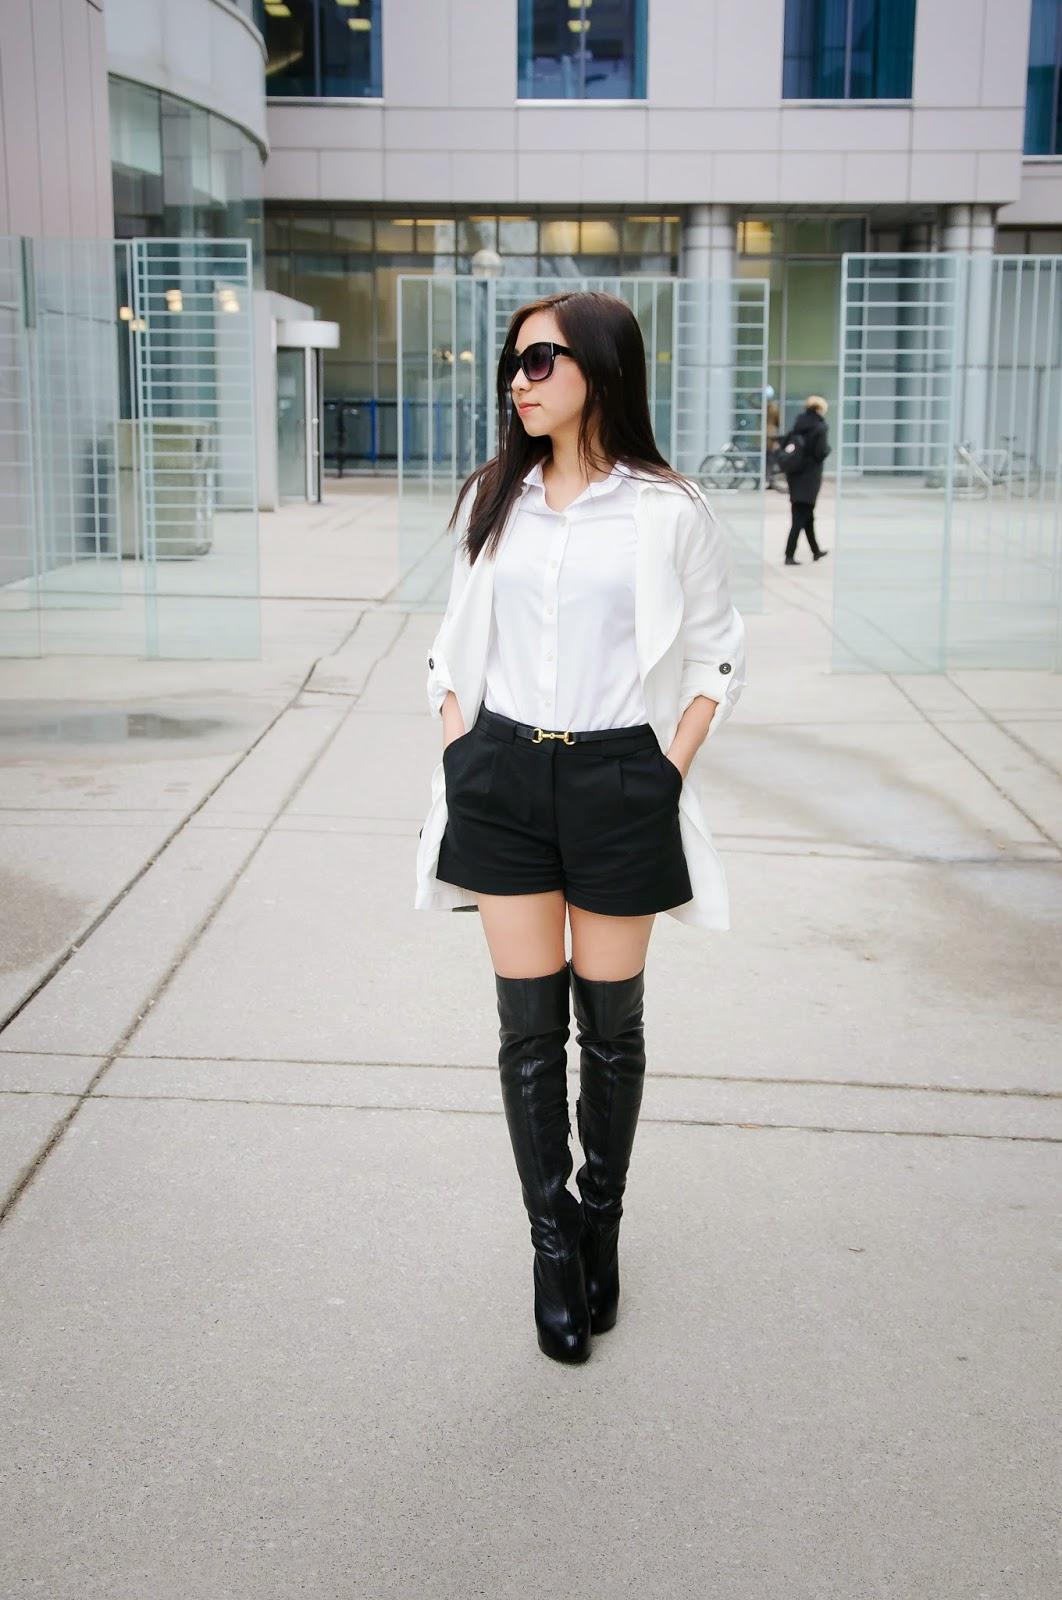 monochrome thigh high boots toronto fashion